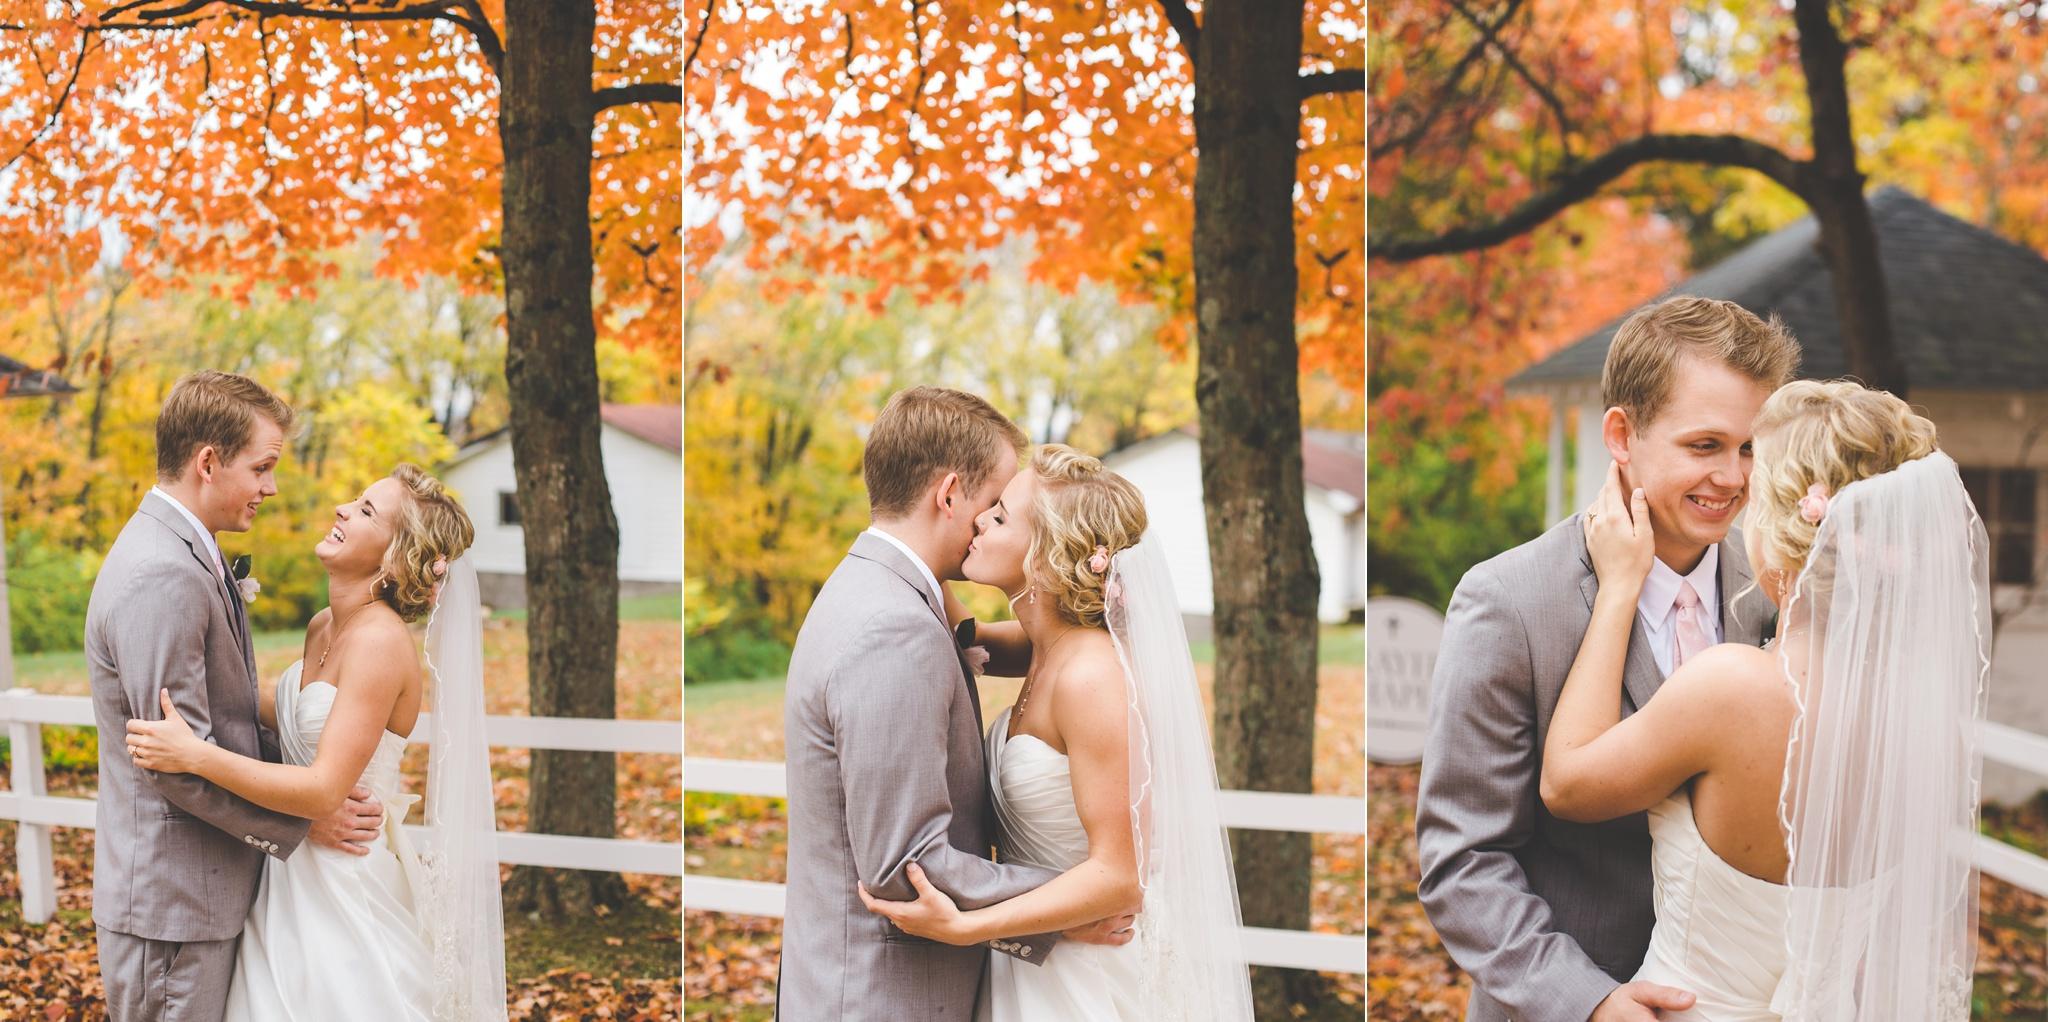 Louisville Wedding Photographer | Fall Wedding_0050.jpg